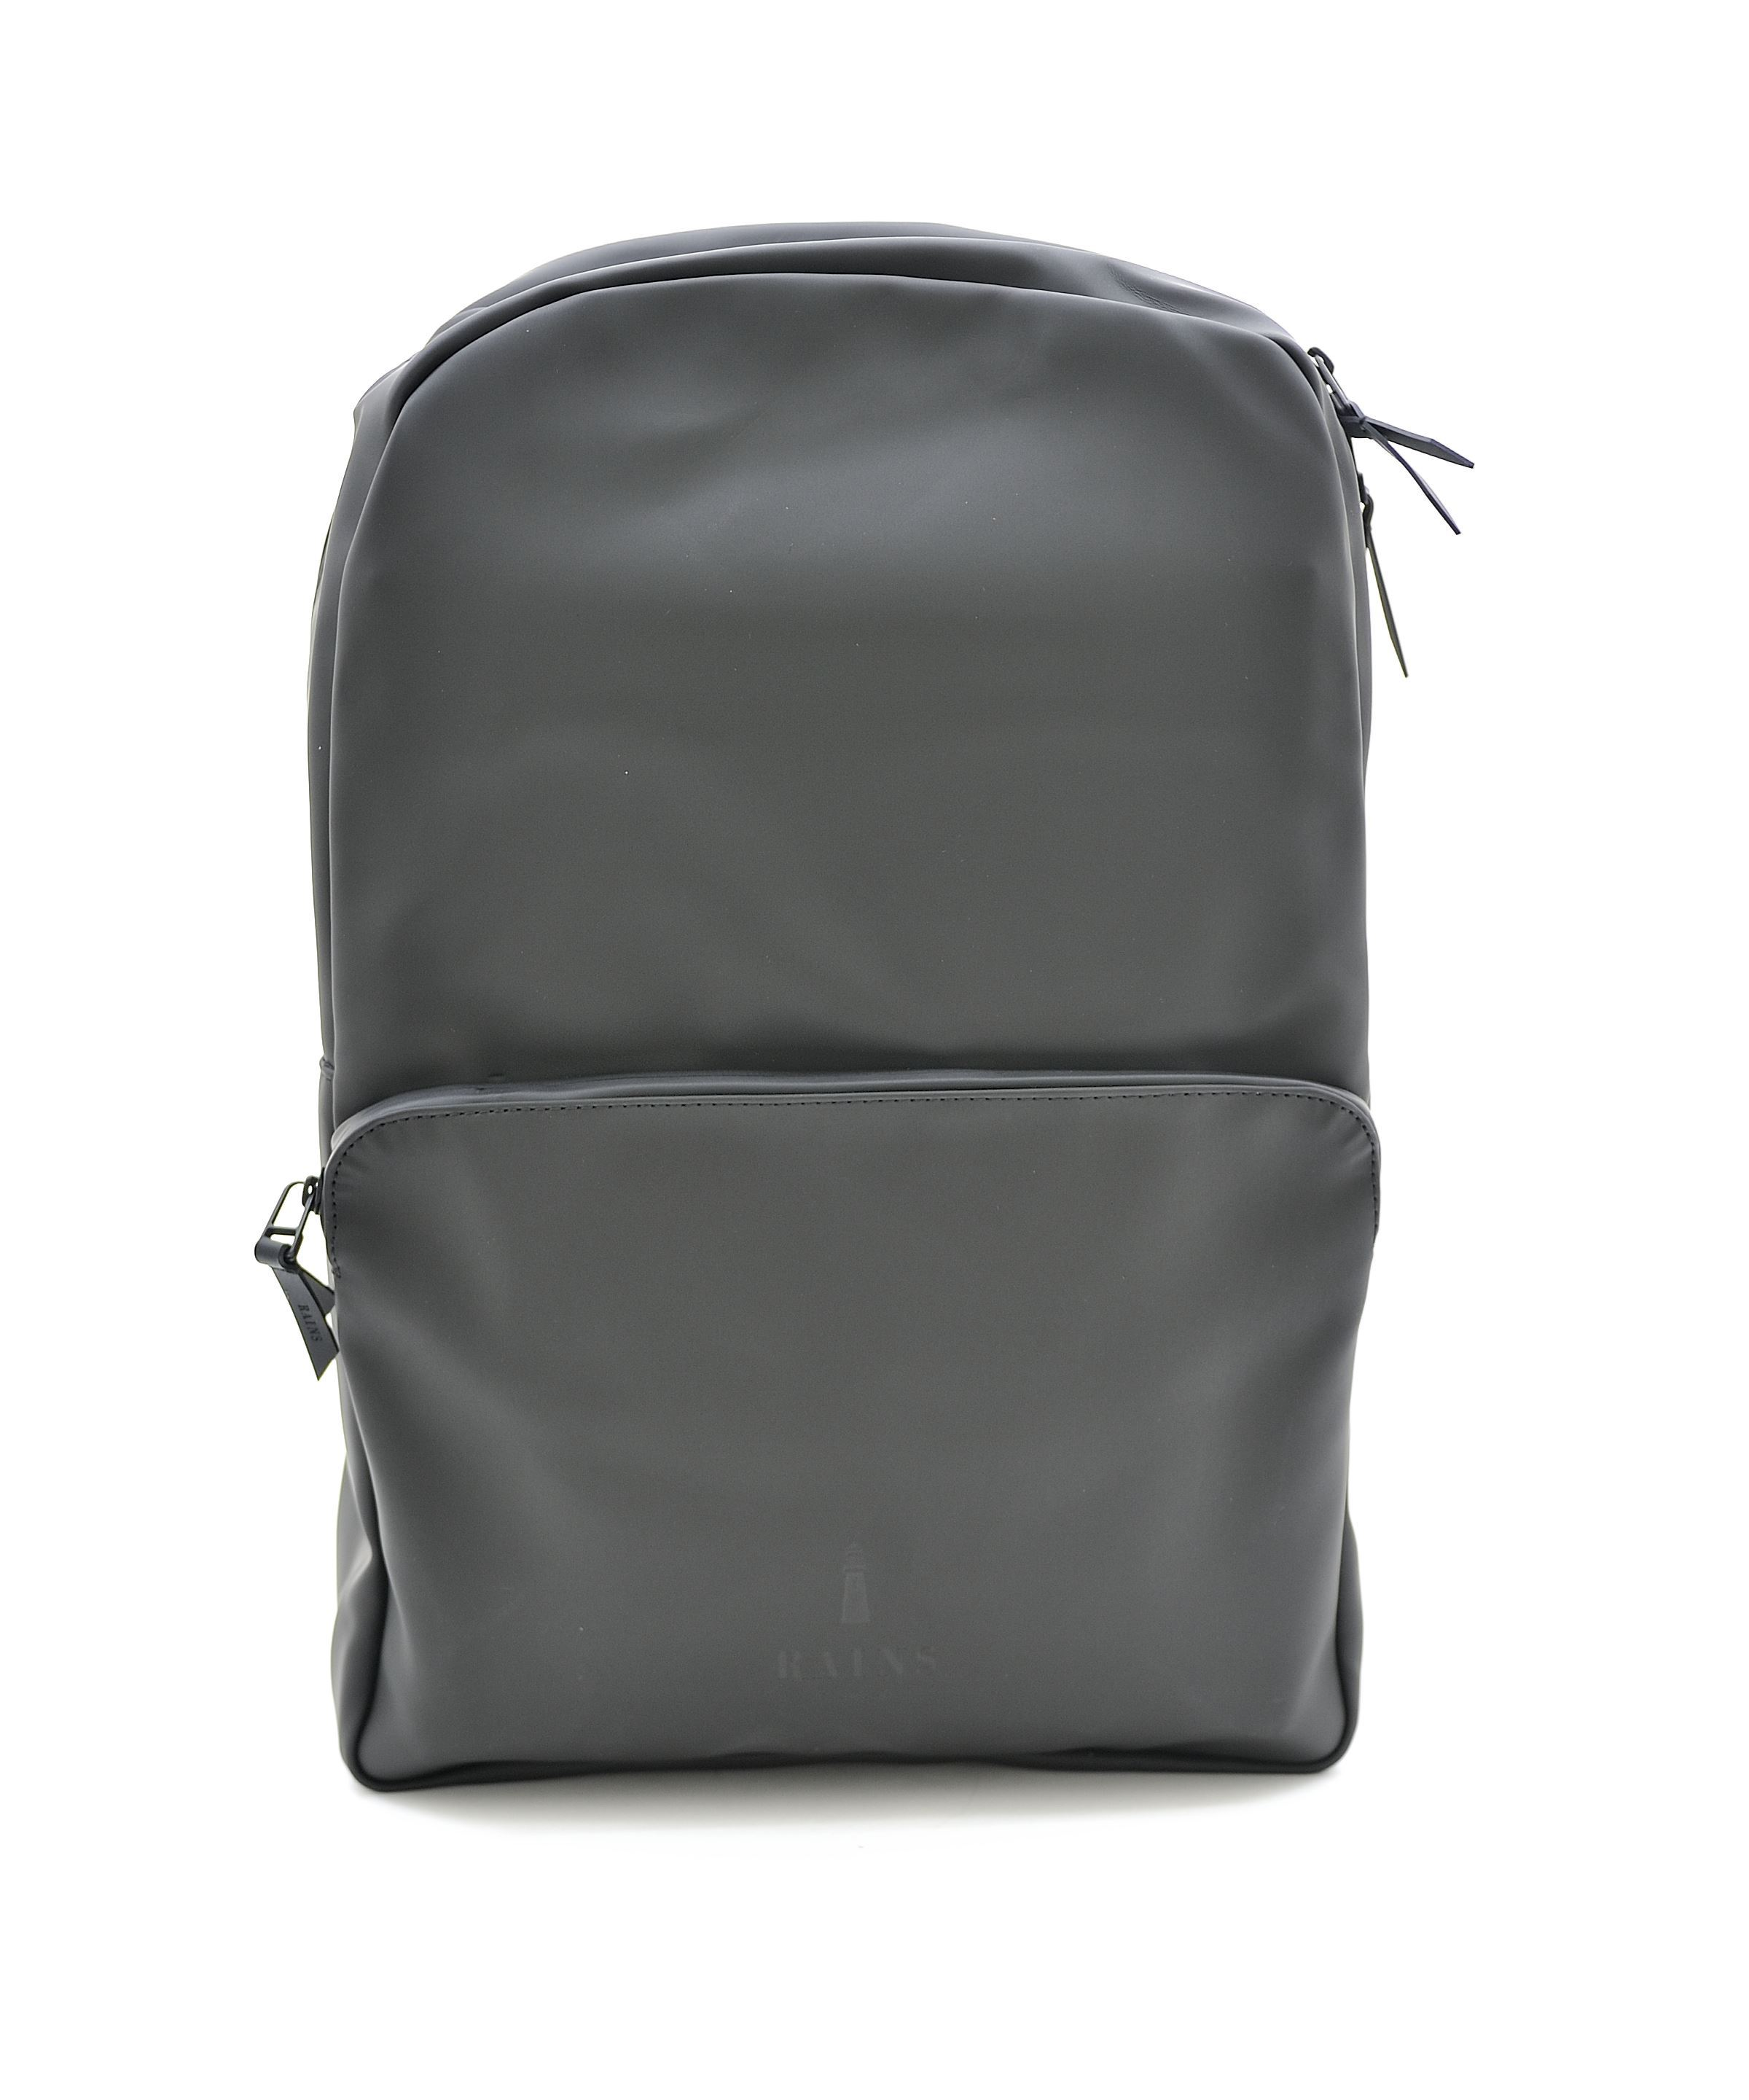 Picture of Field bag nero